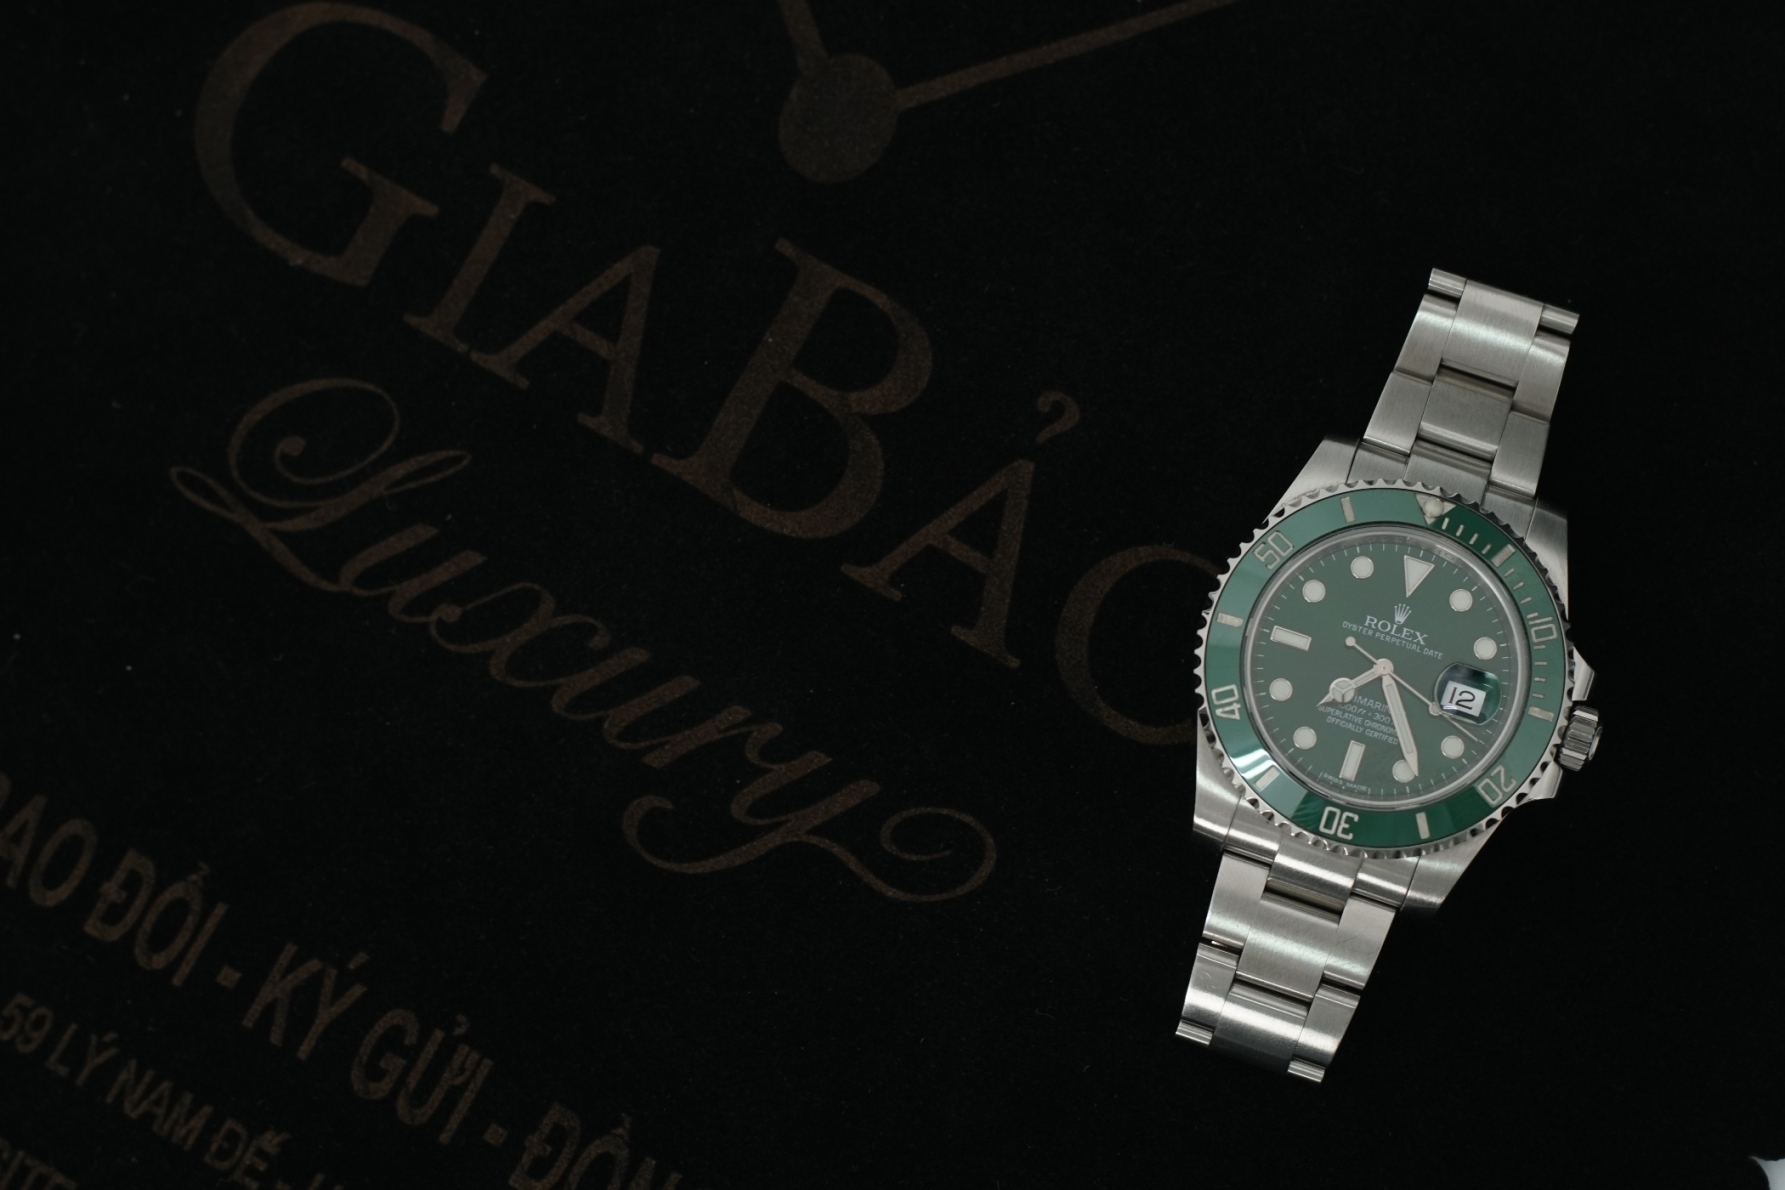 đồng hồ rolex submariner date 116610LV